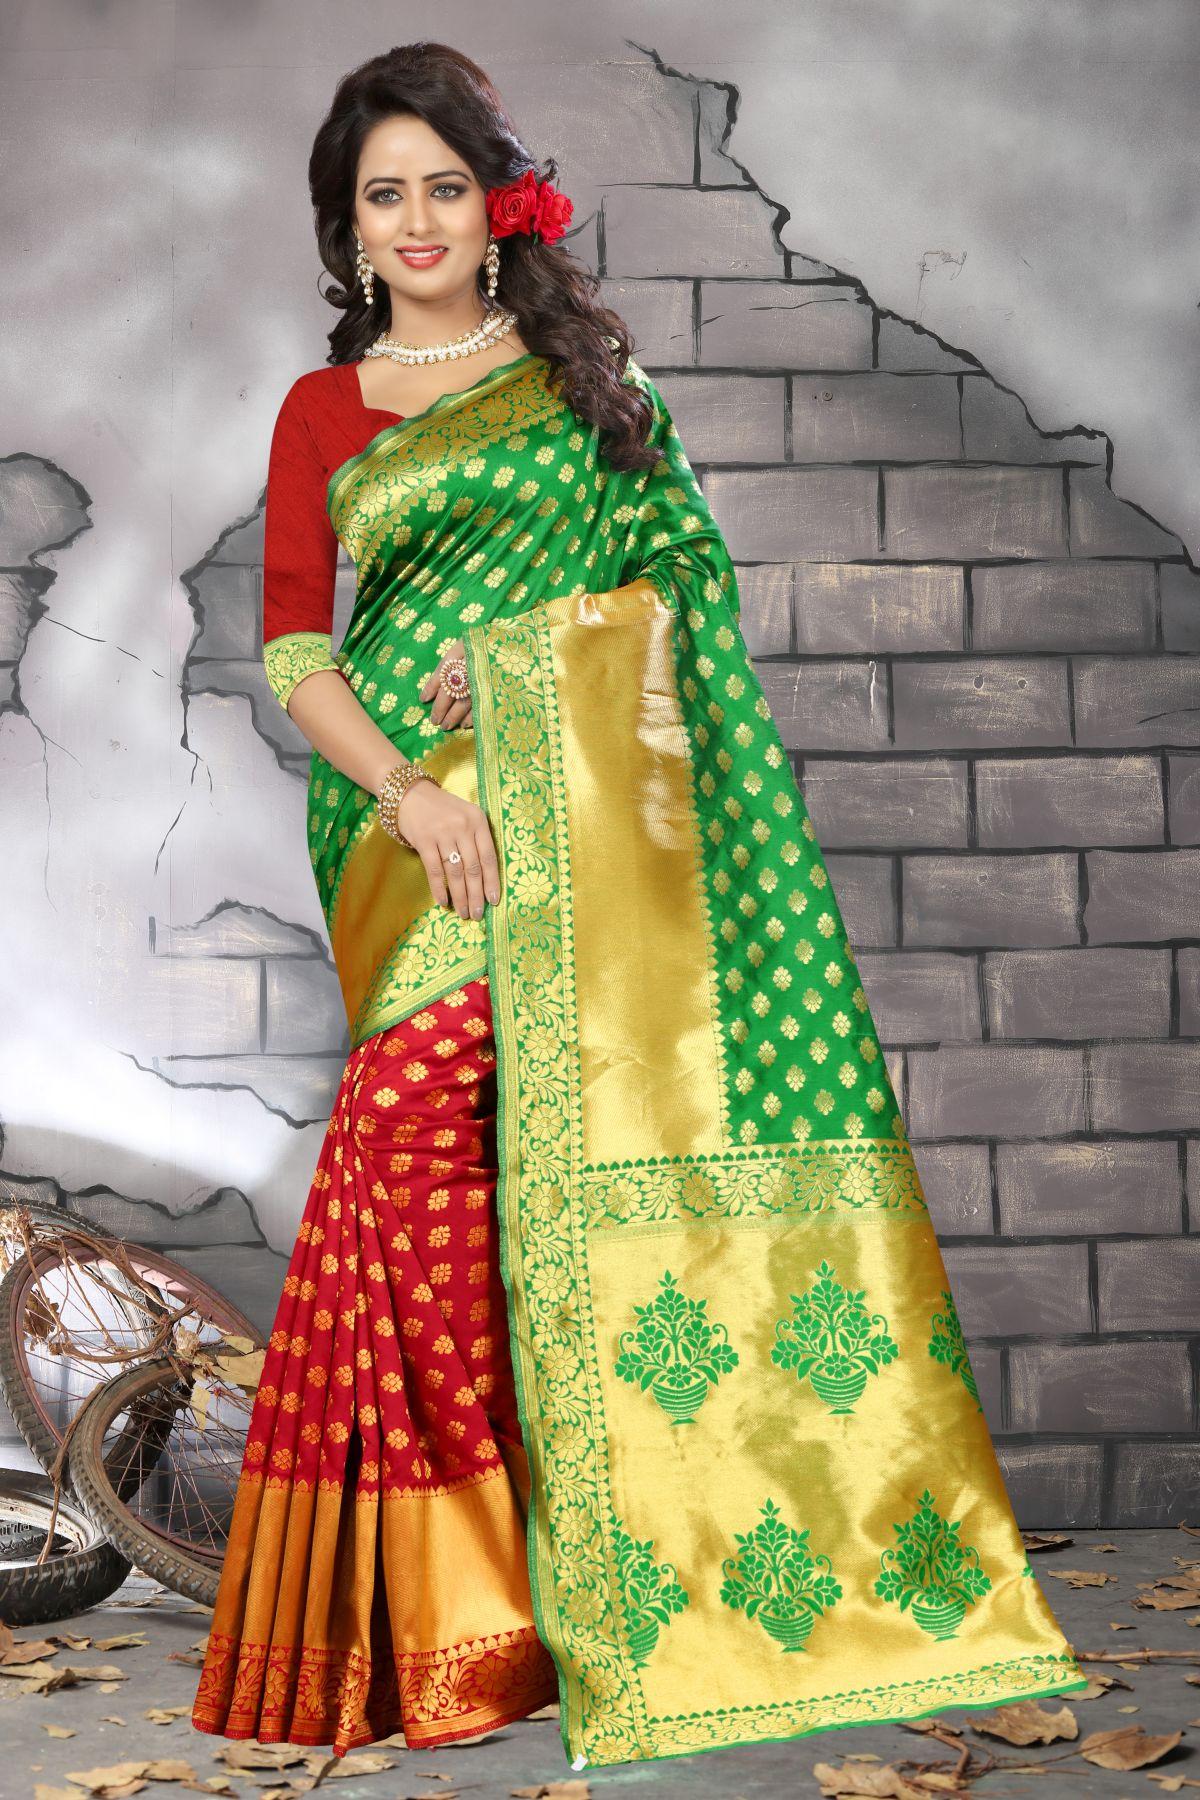 Woven Banarasi Silk Saree in Red